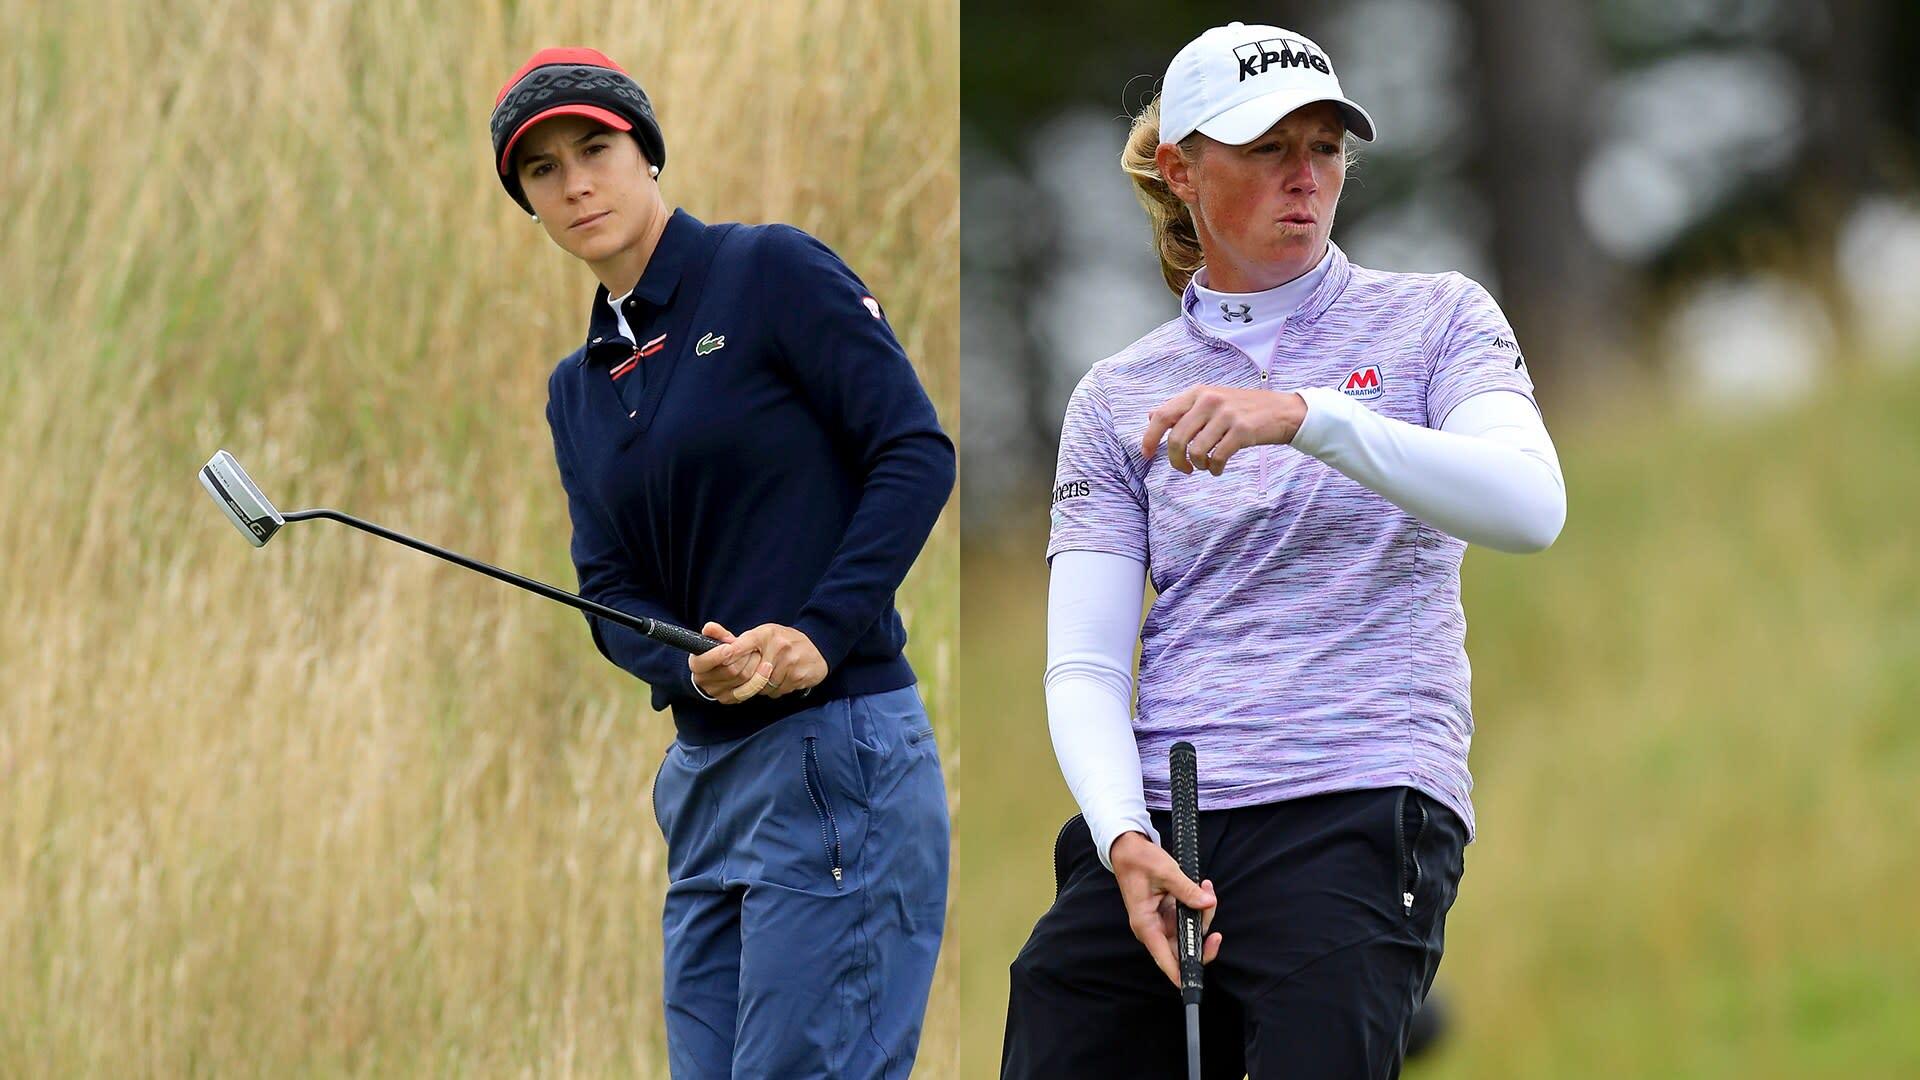 Azahara Munoz leads Stacy Lewis at Ladies Scottish Open, where Lydia Ko lurks